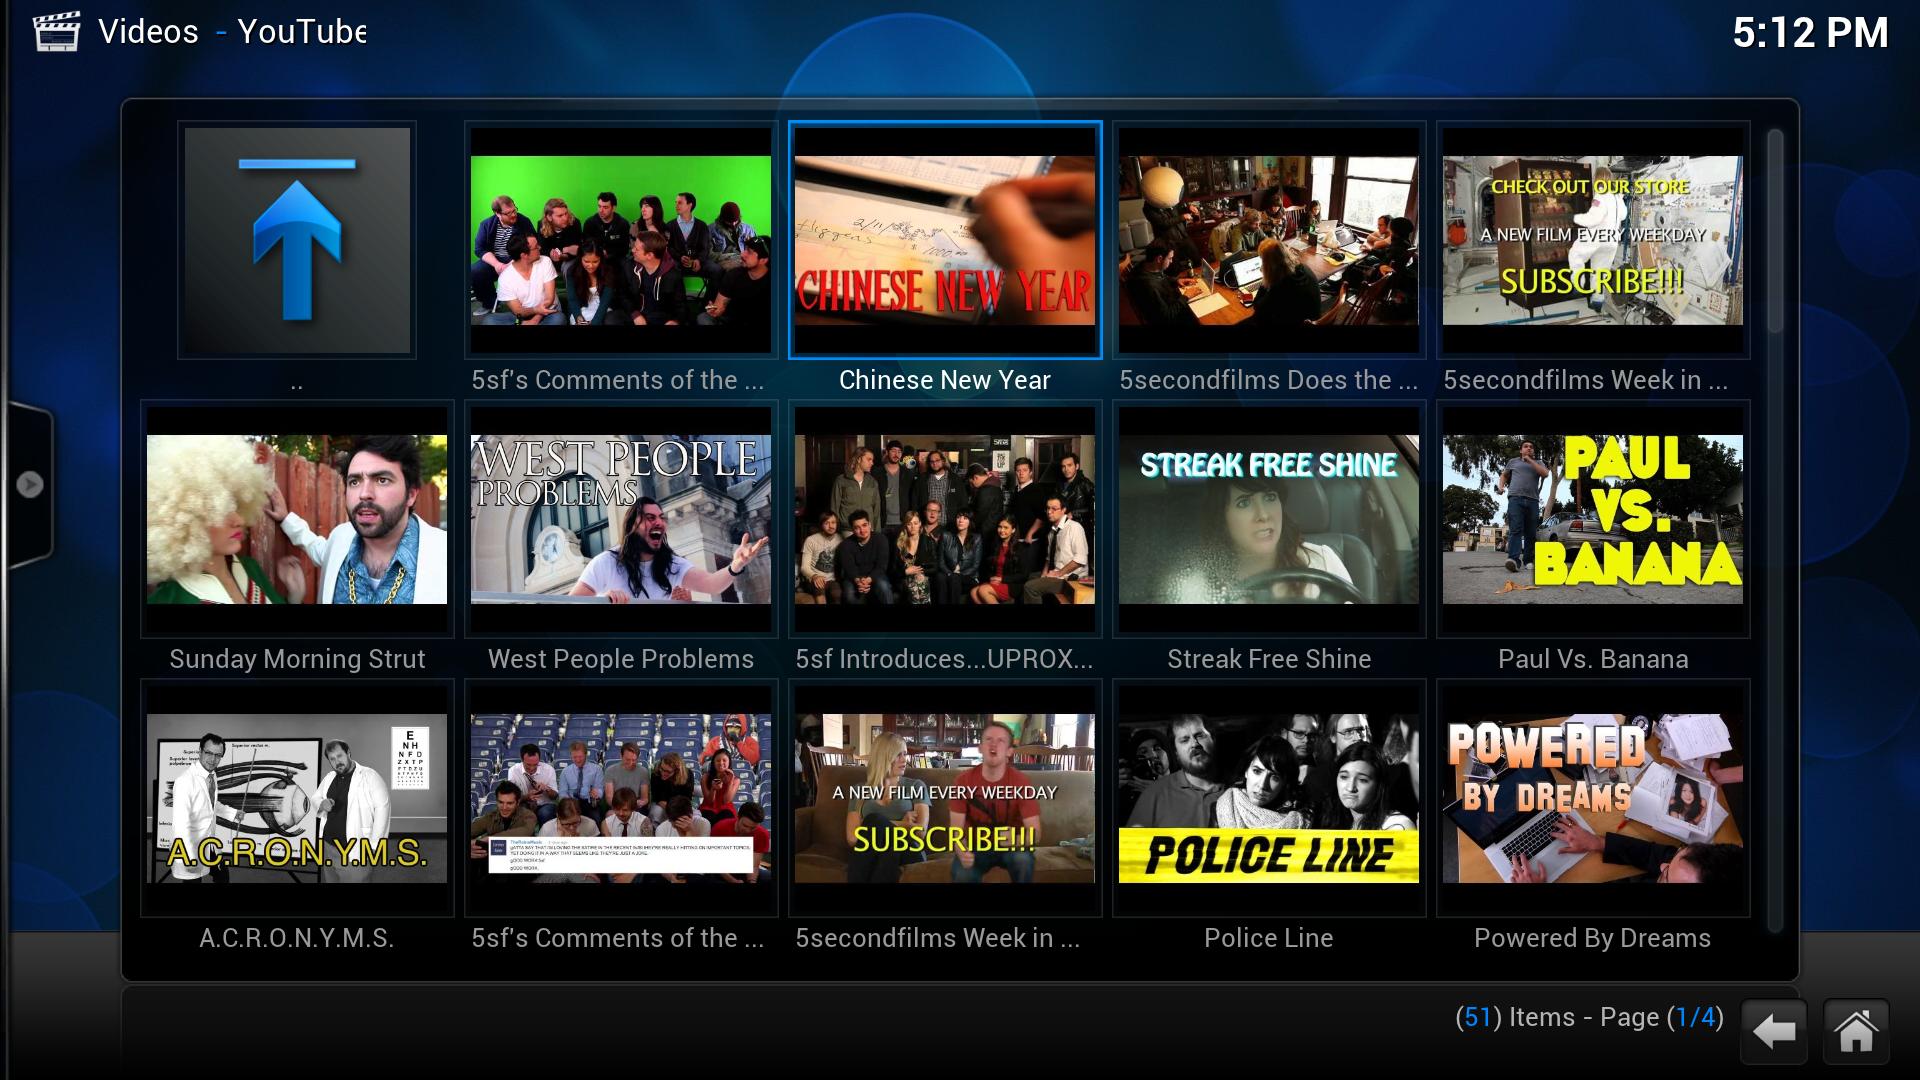 Dejtingprogram tv 3 xbmc